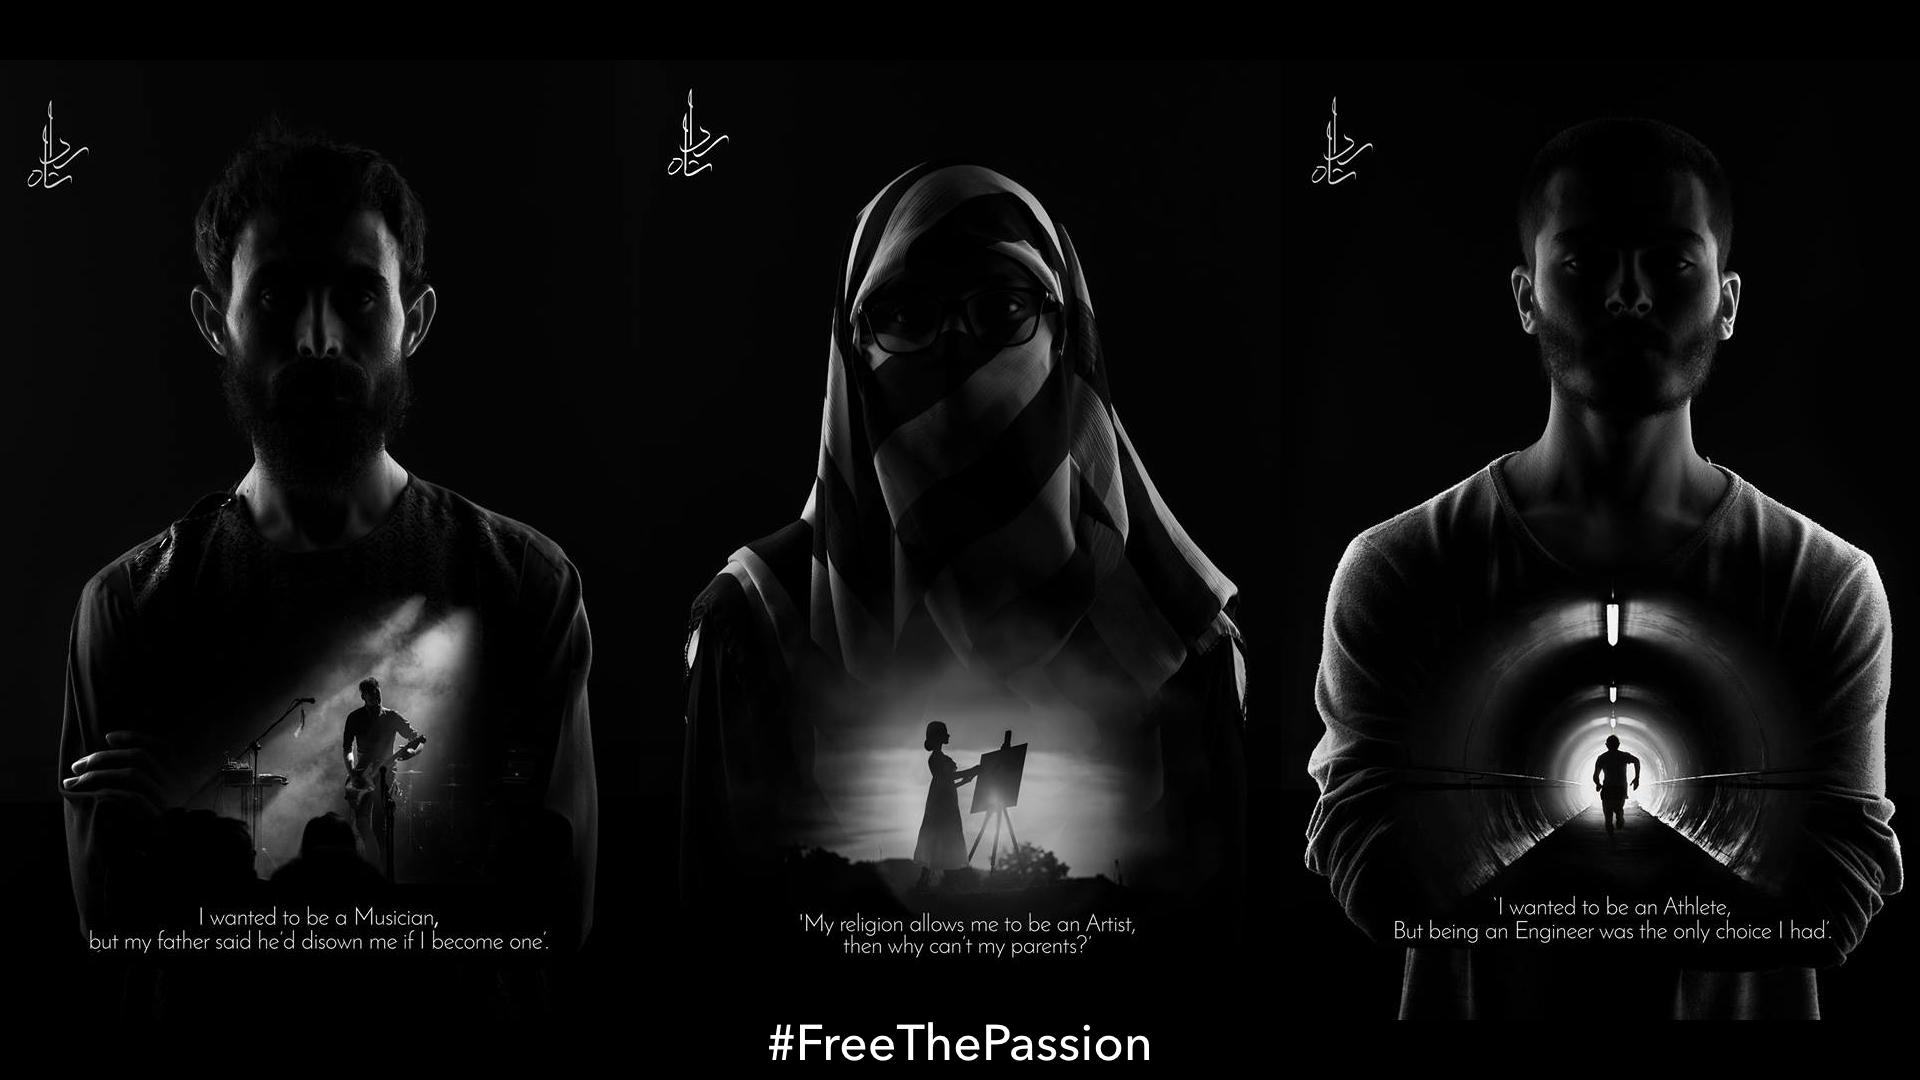 Rida Shah #FreeThePassion